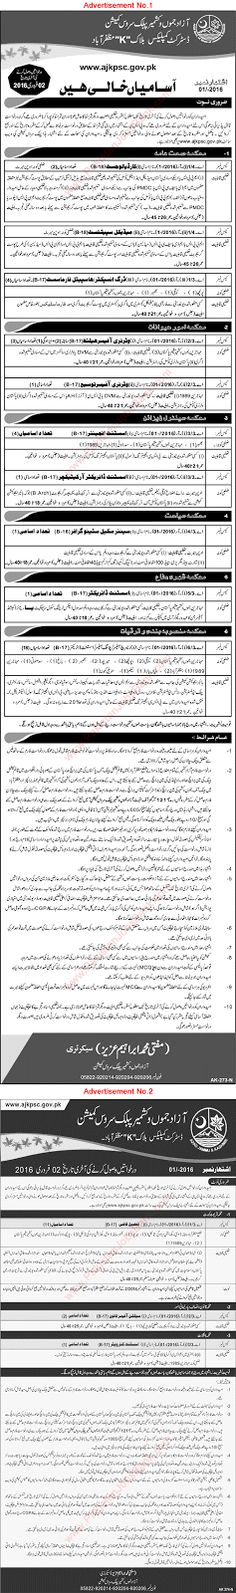 Terra Marine Agencies Private Limited Karachi Jobs Jobs In